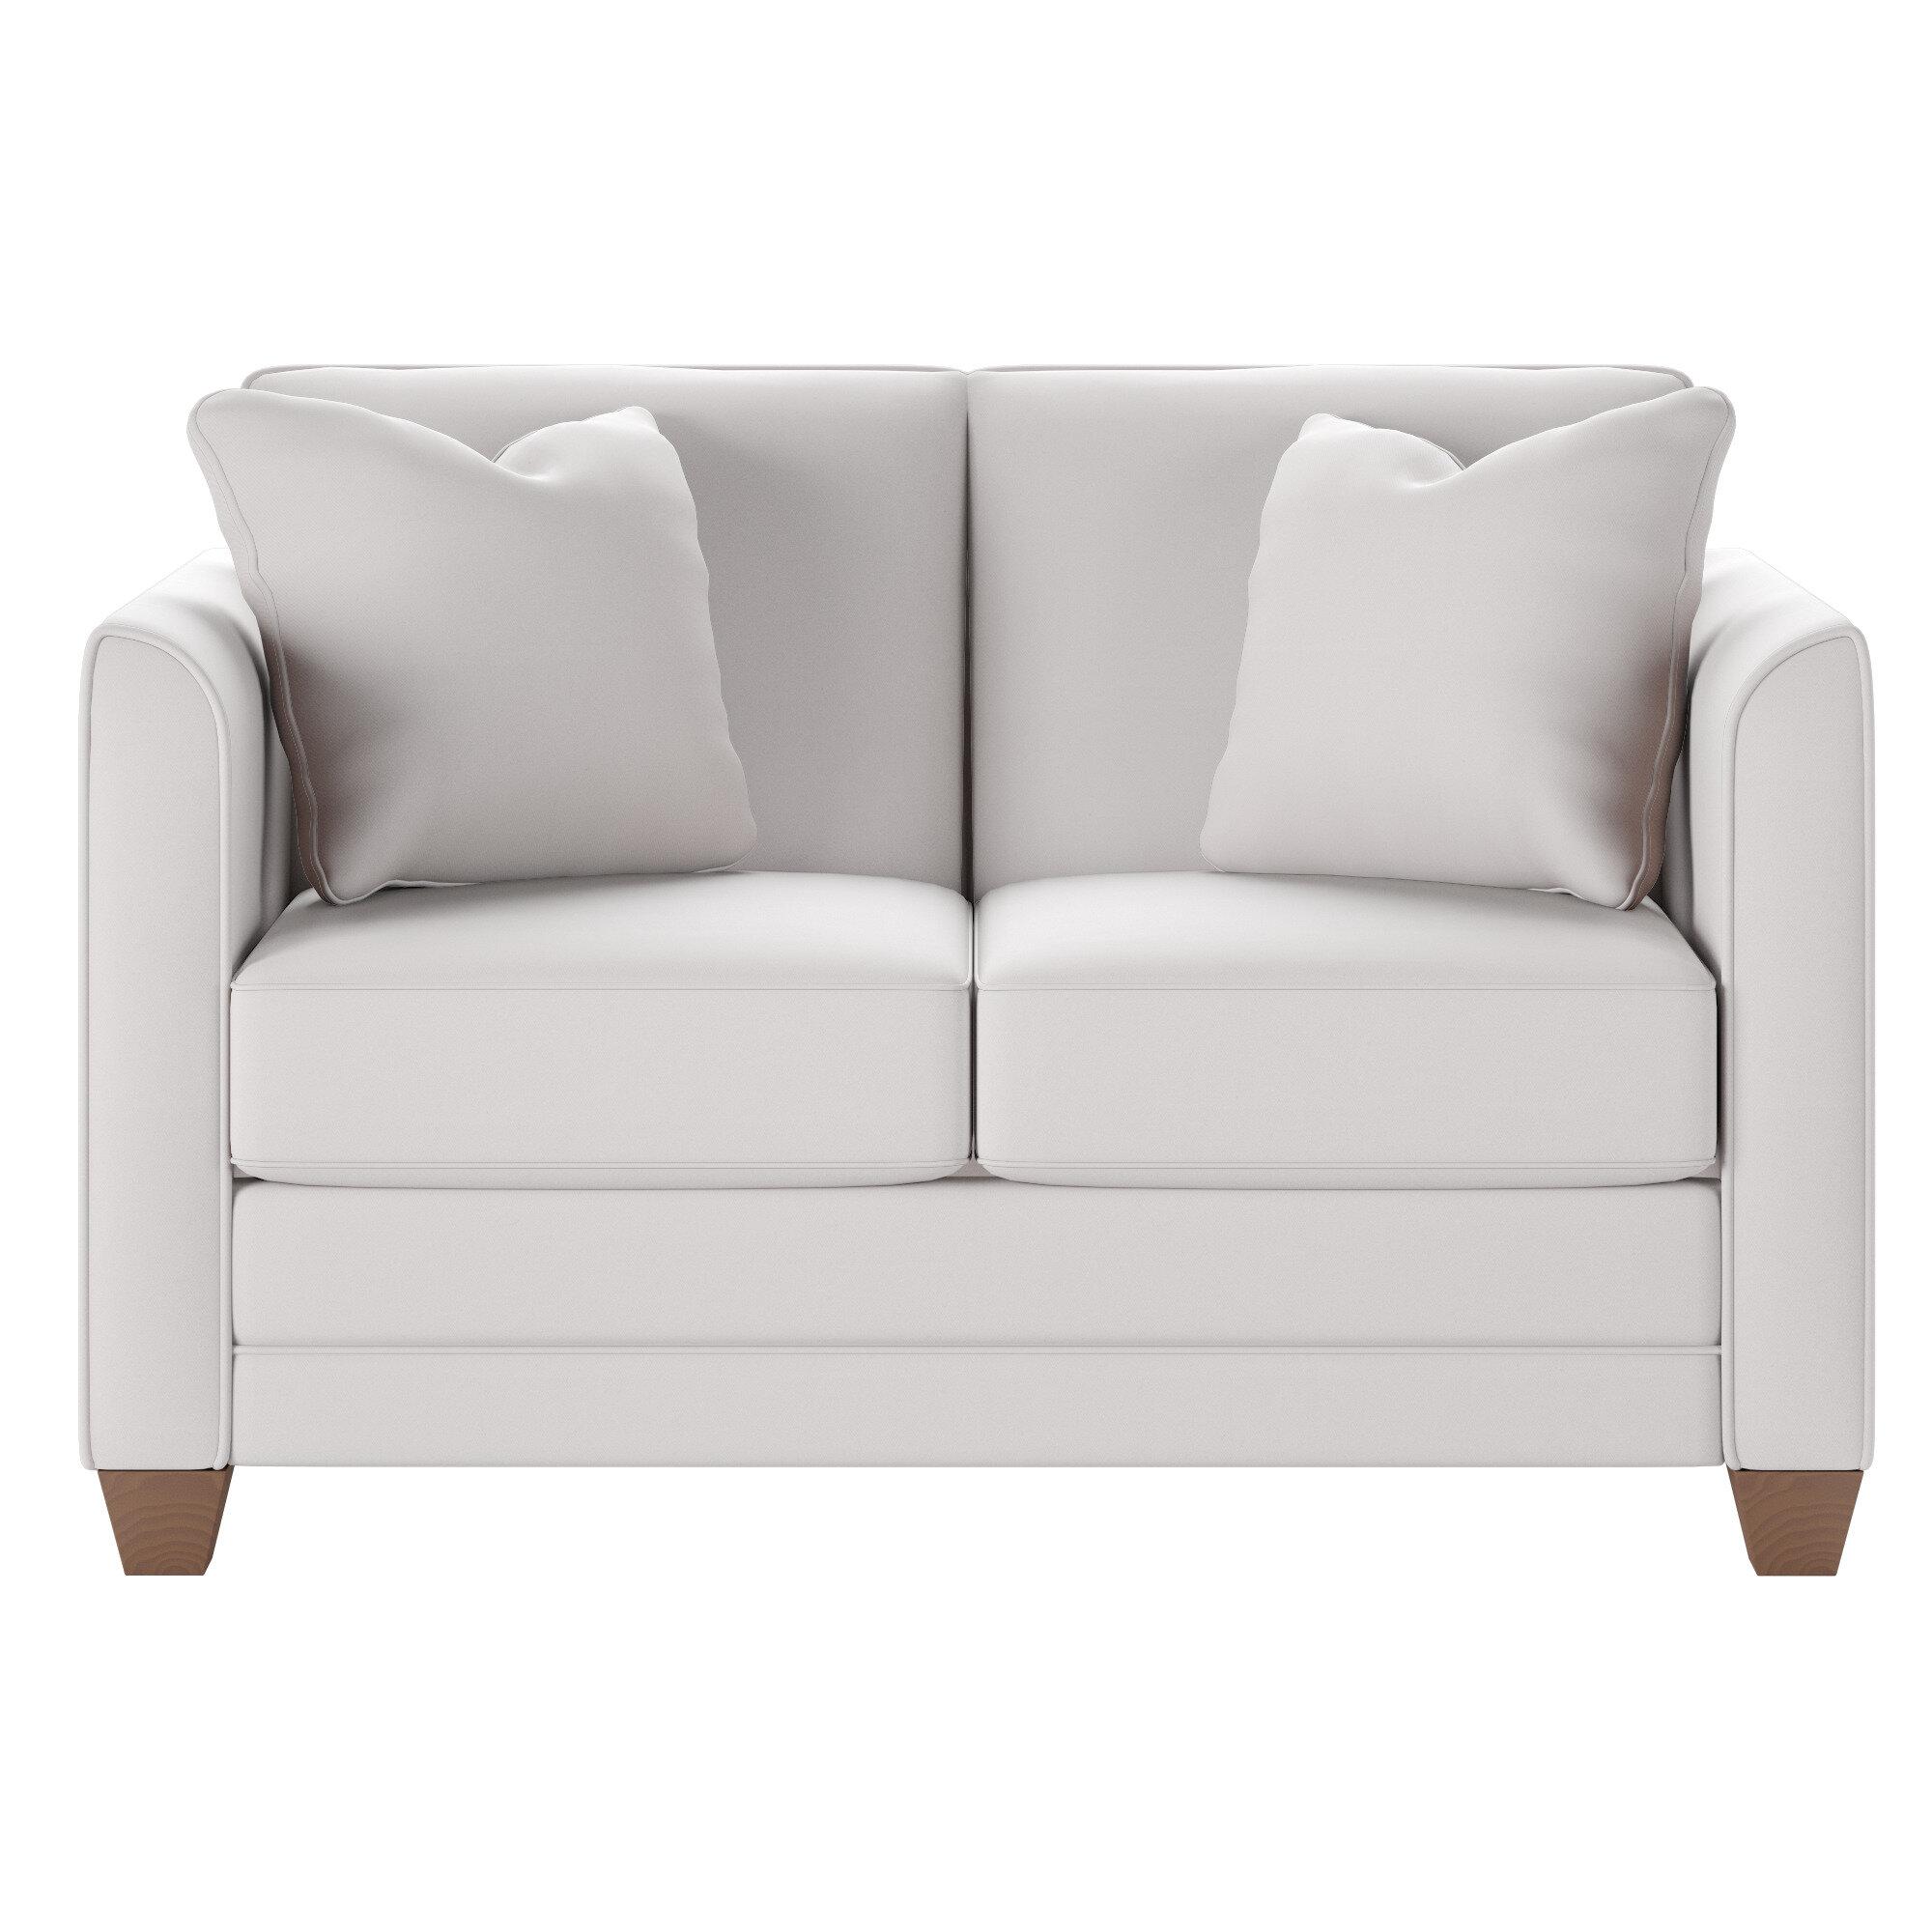 meules s medium nougat stella quatre and sofa dexter measurements the furniture linens linen in chaise pin pinterest loveseat